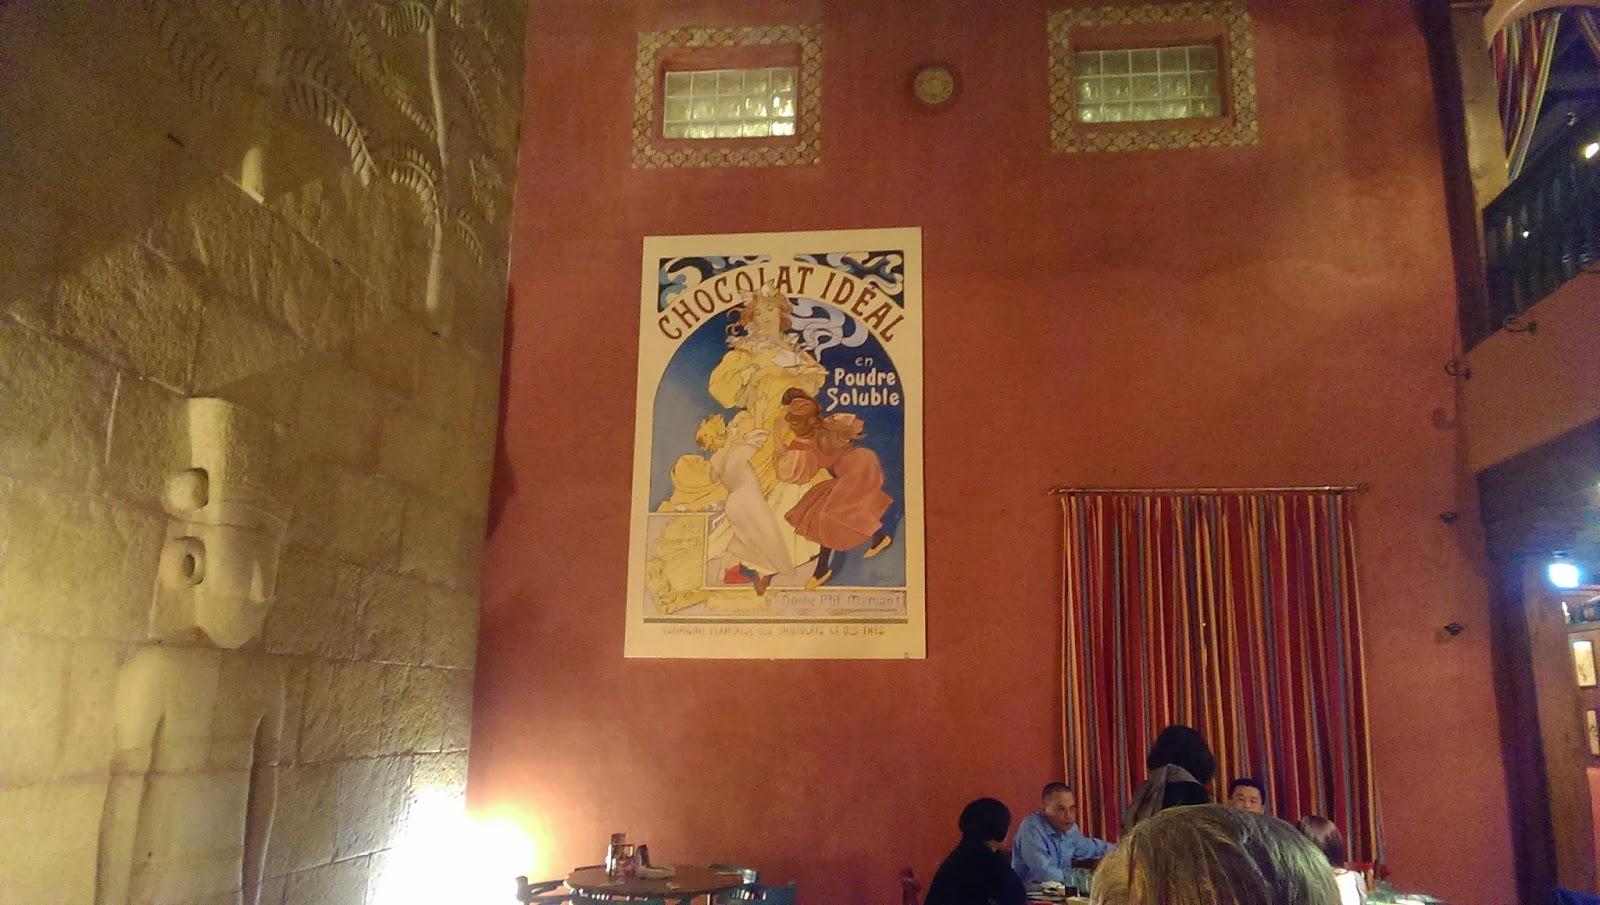 2015 01 24%2B18.29.45 - [食記] Smokey Joe's 冒煙的喬 高雄左營的美式墨西哥餐廳!